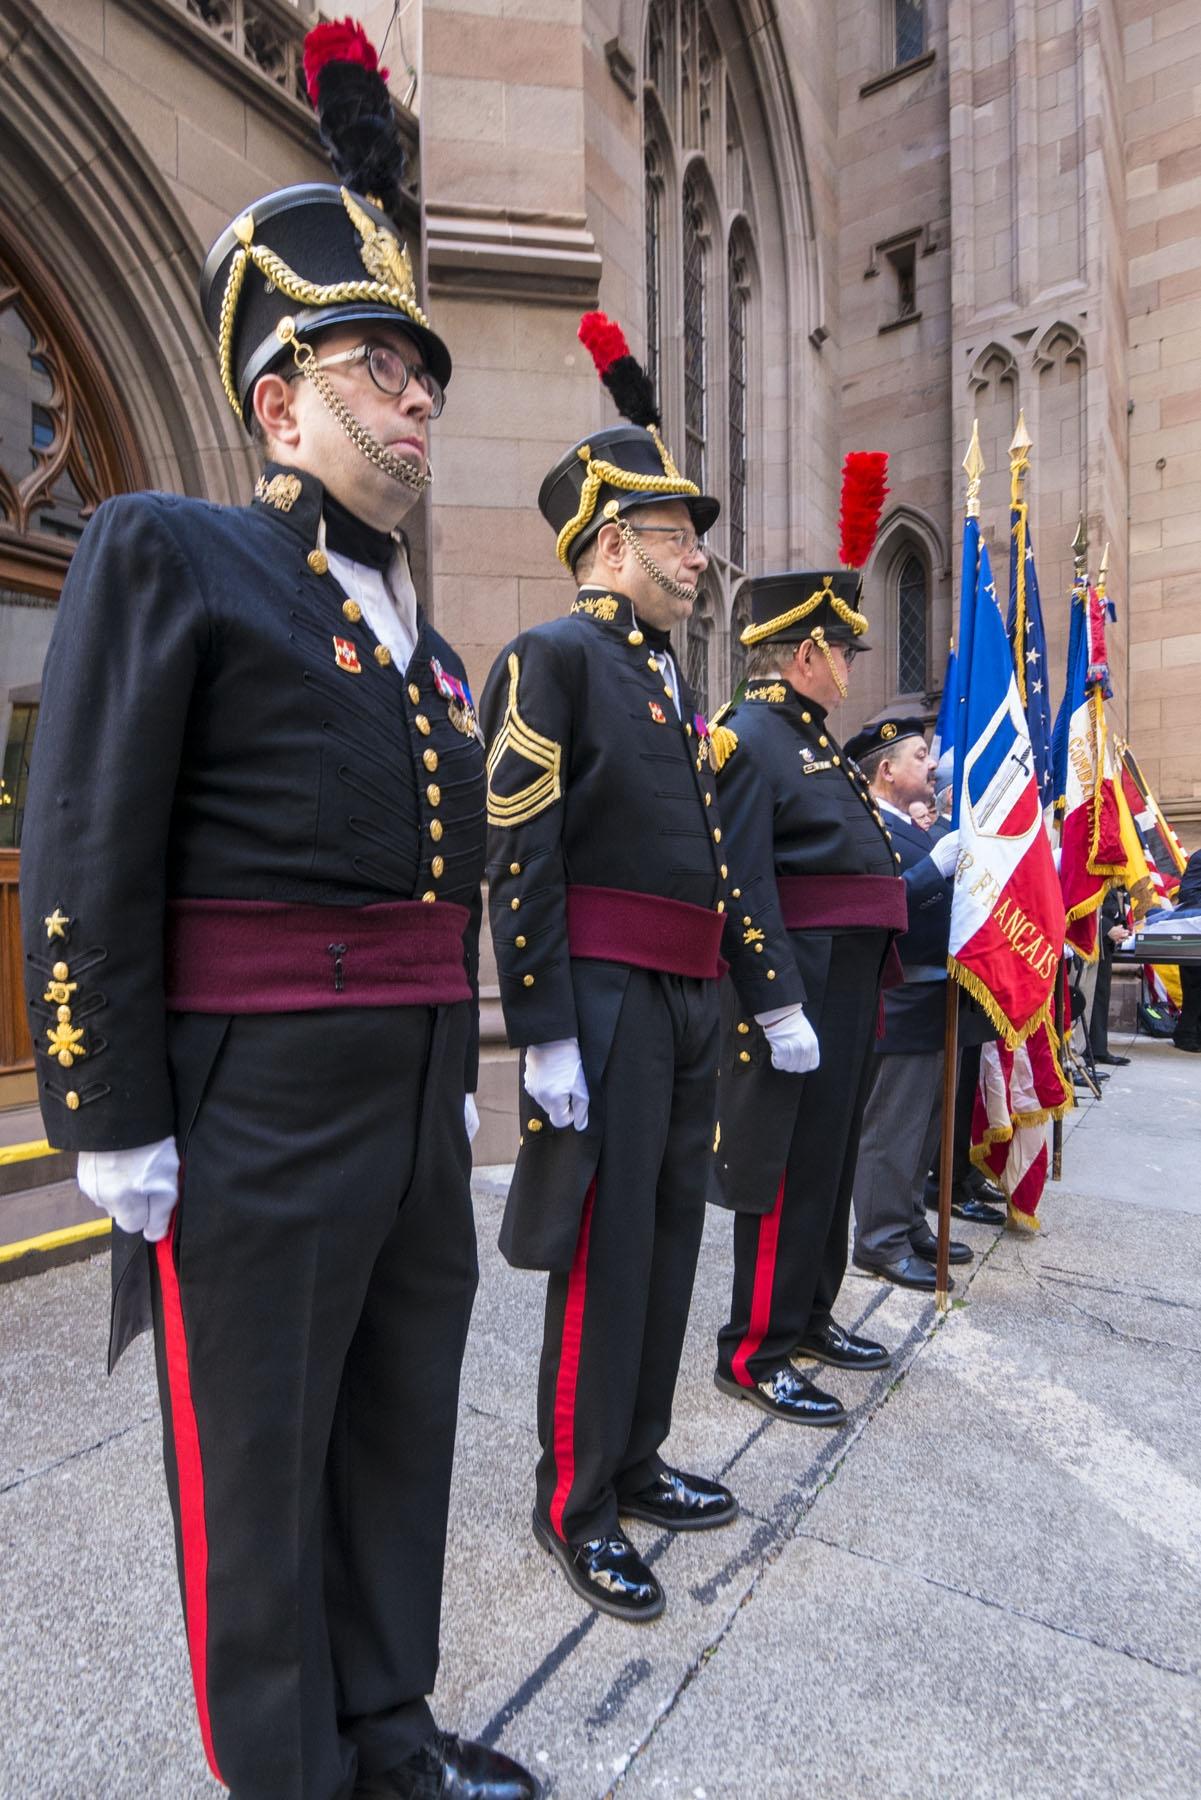 20161015-1143-Veteran-Artillery-Corps-FACF-FWV-Falgerho-cc